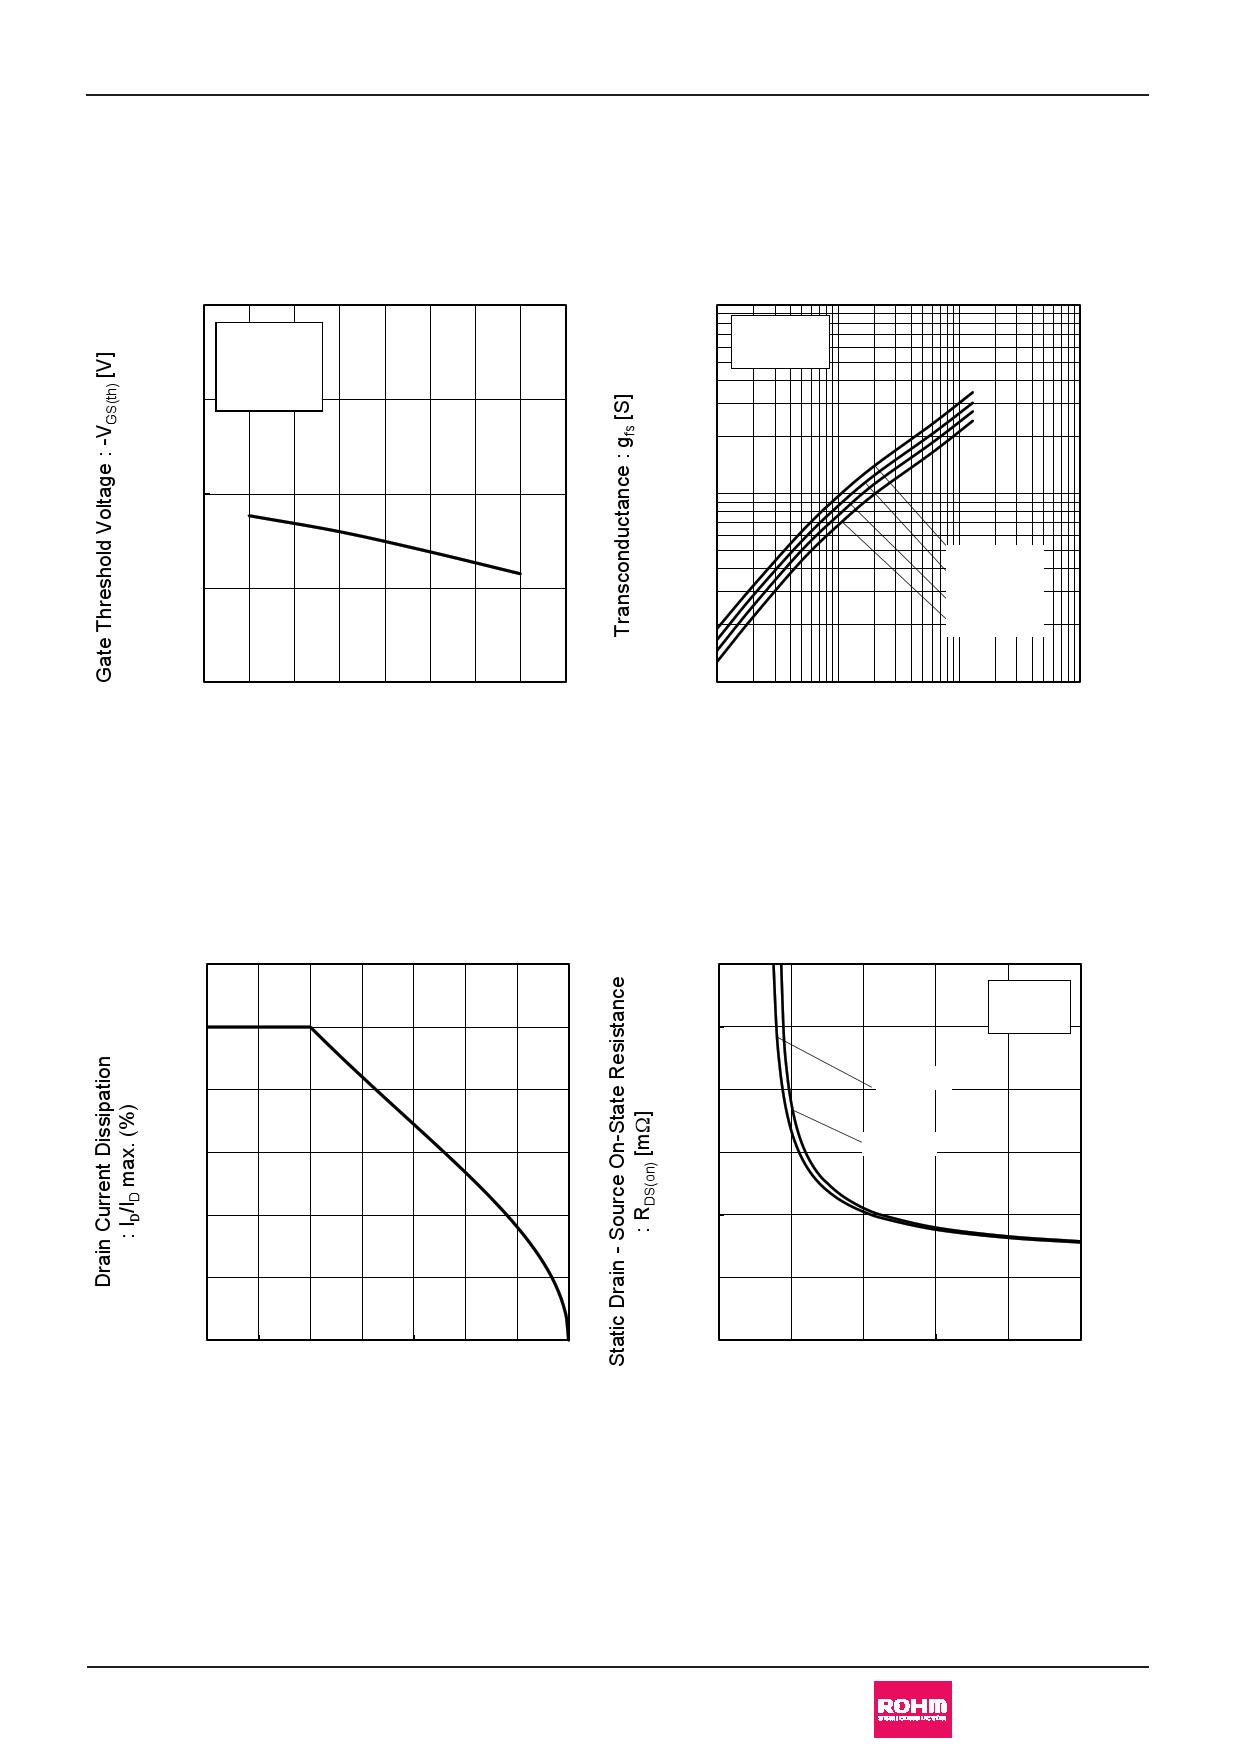 RW1A013ZP Datasheet, Funktion